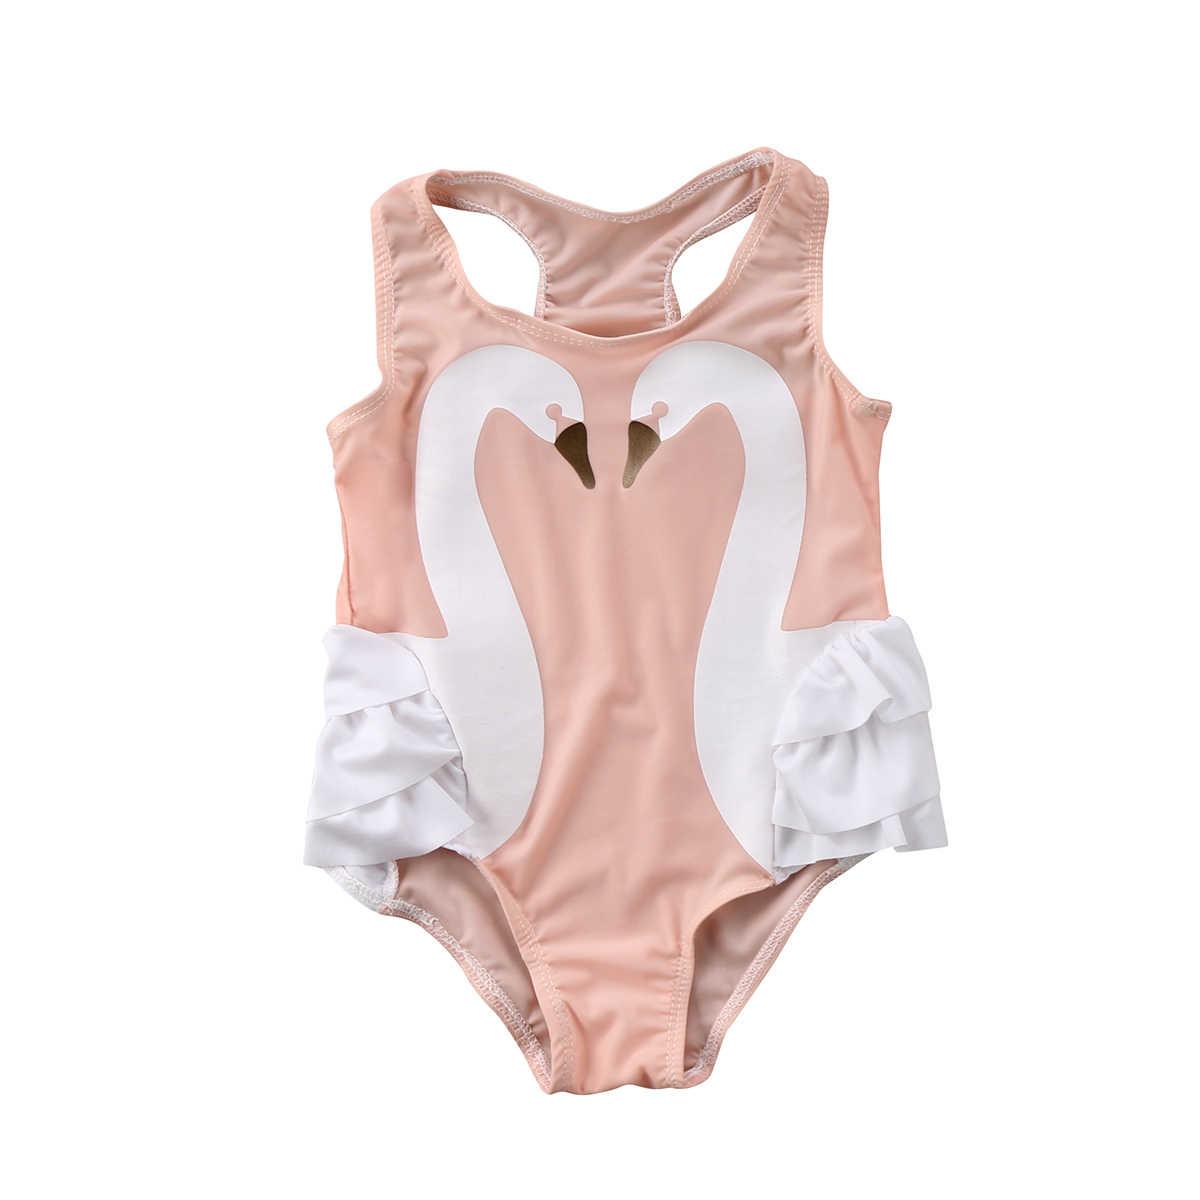 74803c25f055 Summer Baby Girl Swimsuit Lovely Swan Bikini Toddler Baby Kids Girls Tutu  Swimsuit Swimwear Ruffle Bikini